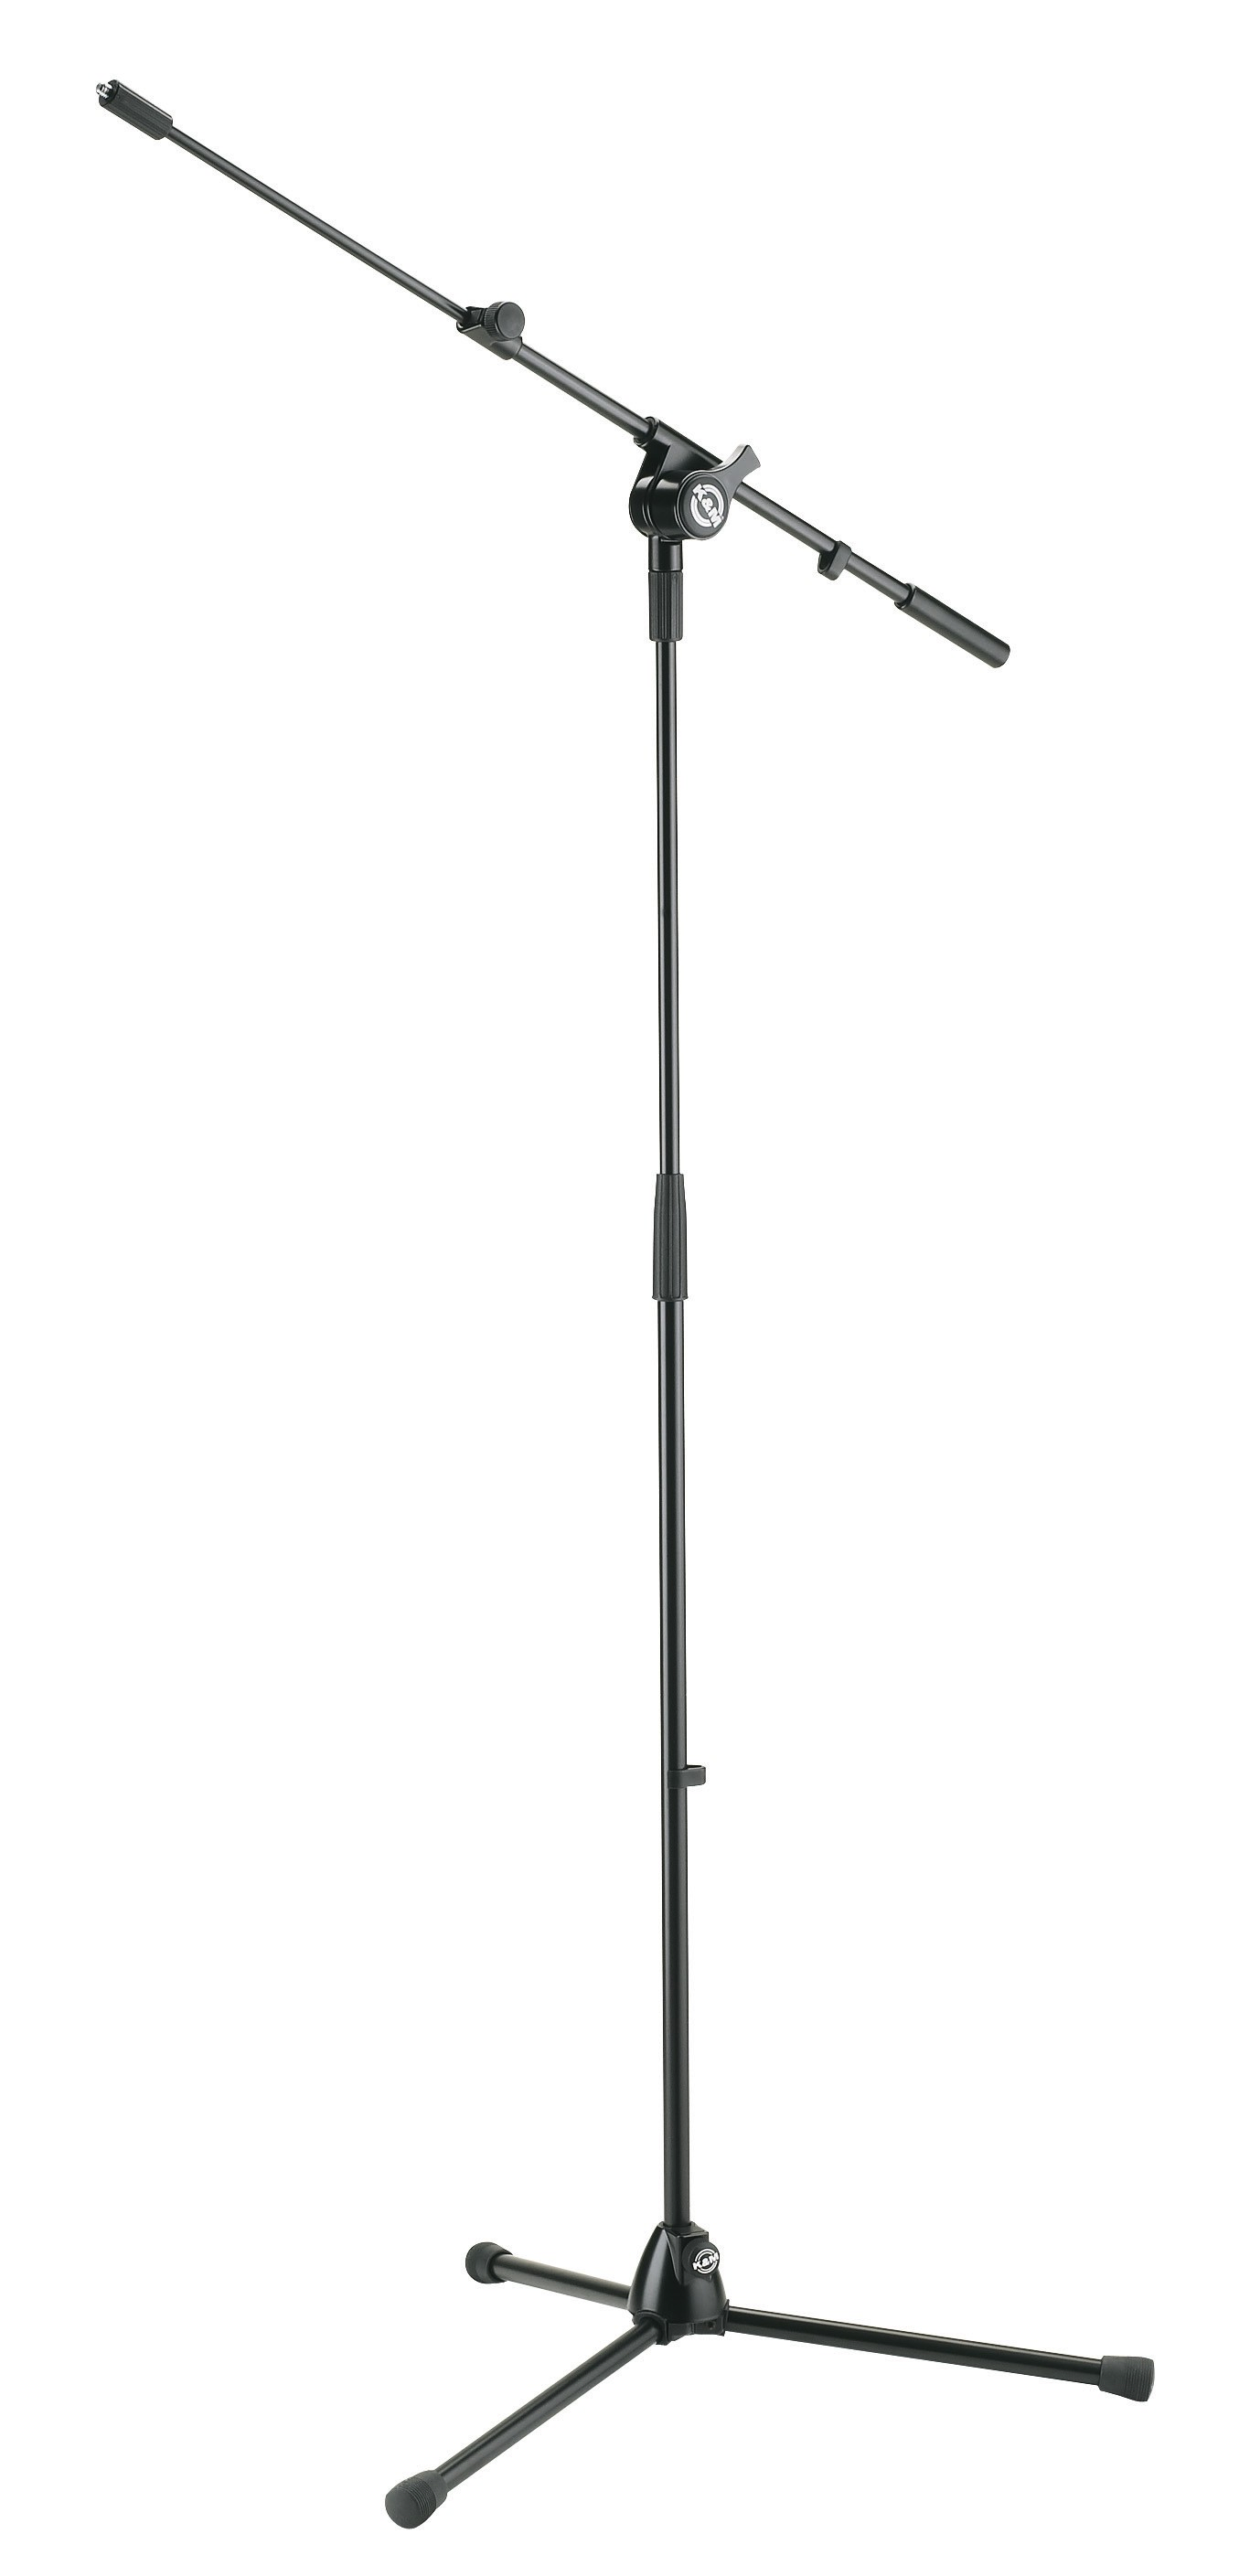 Konig & Meyer 25600 Microphone Stand